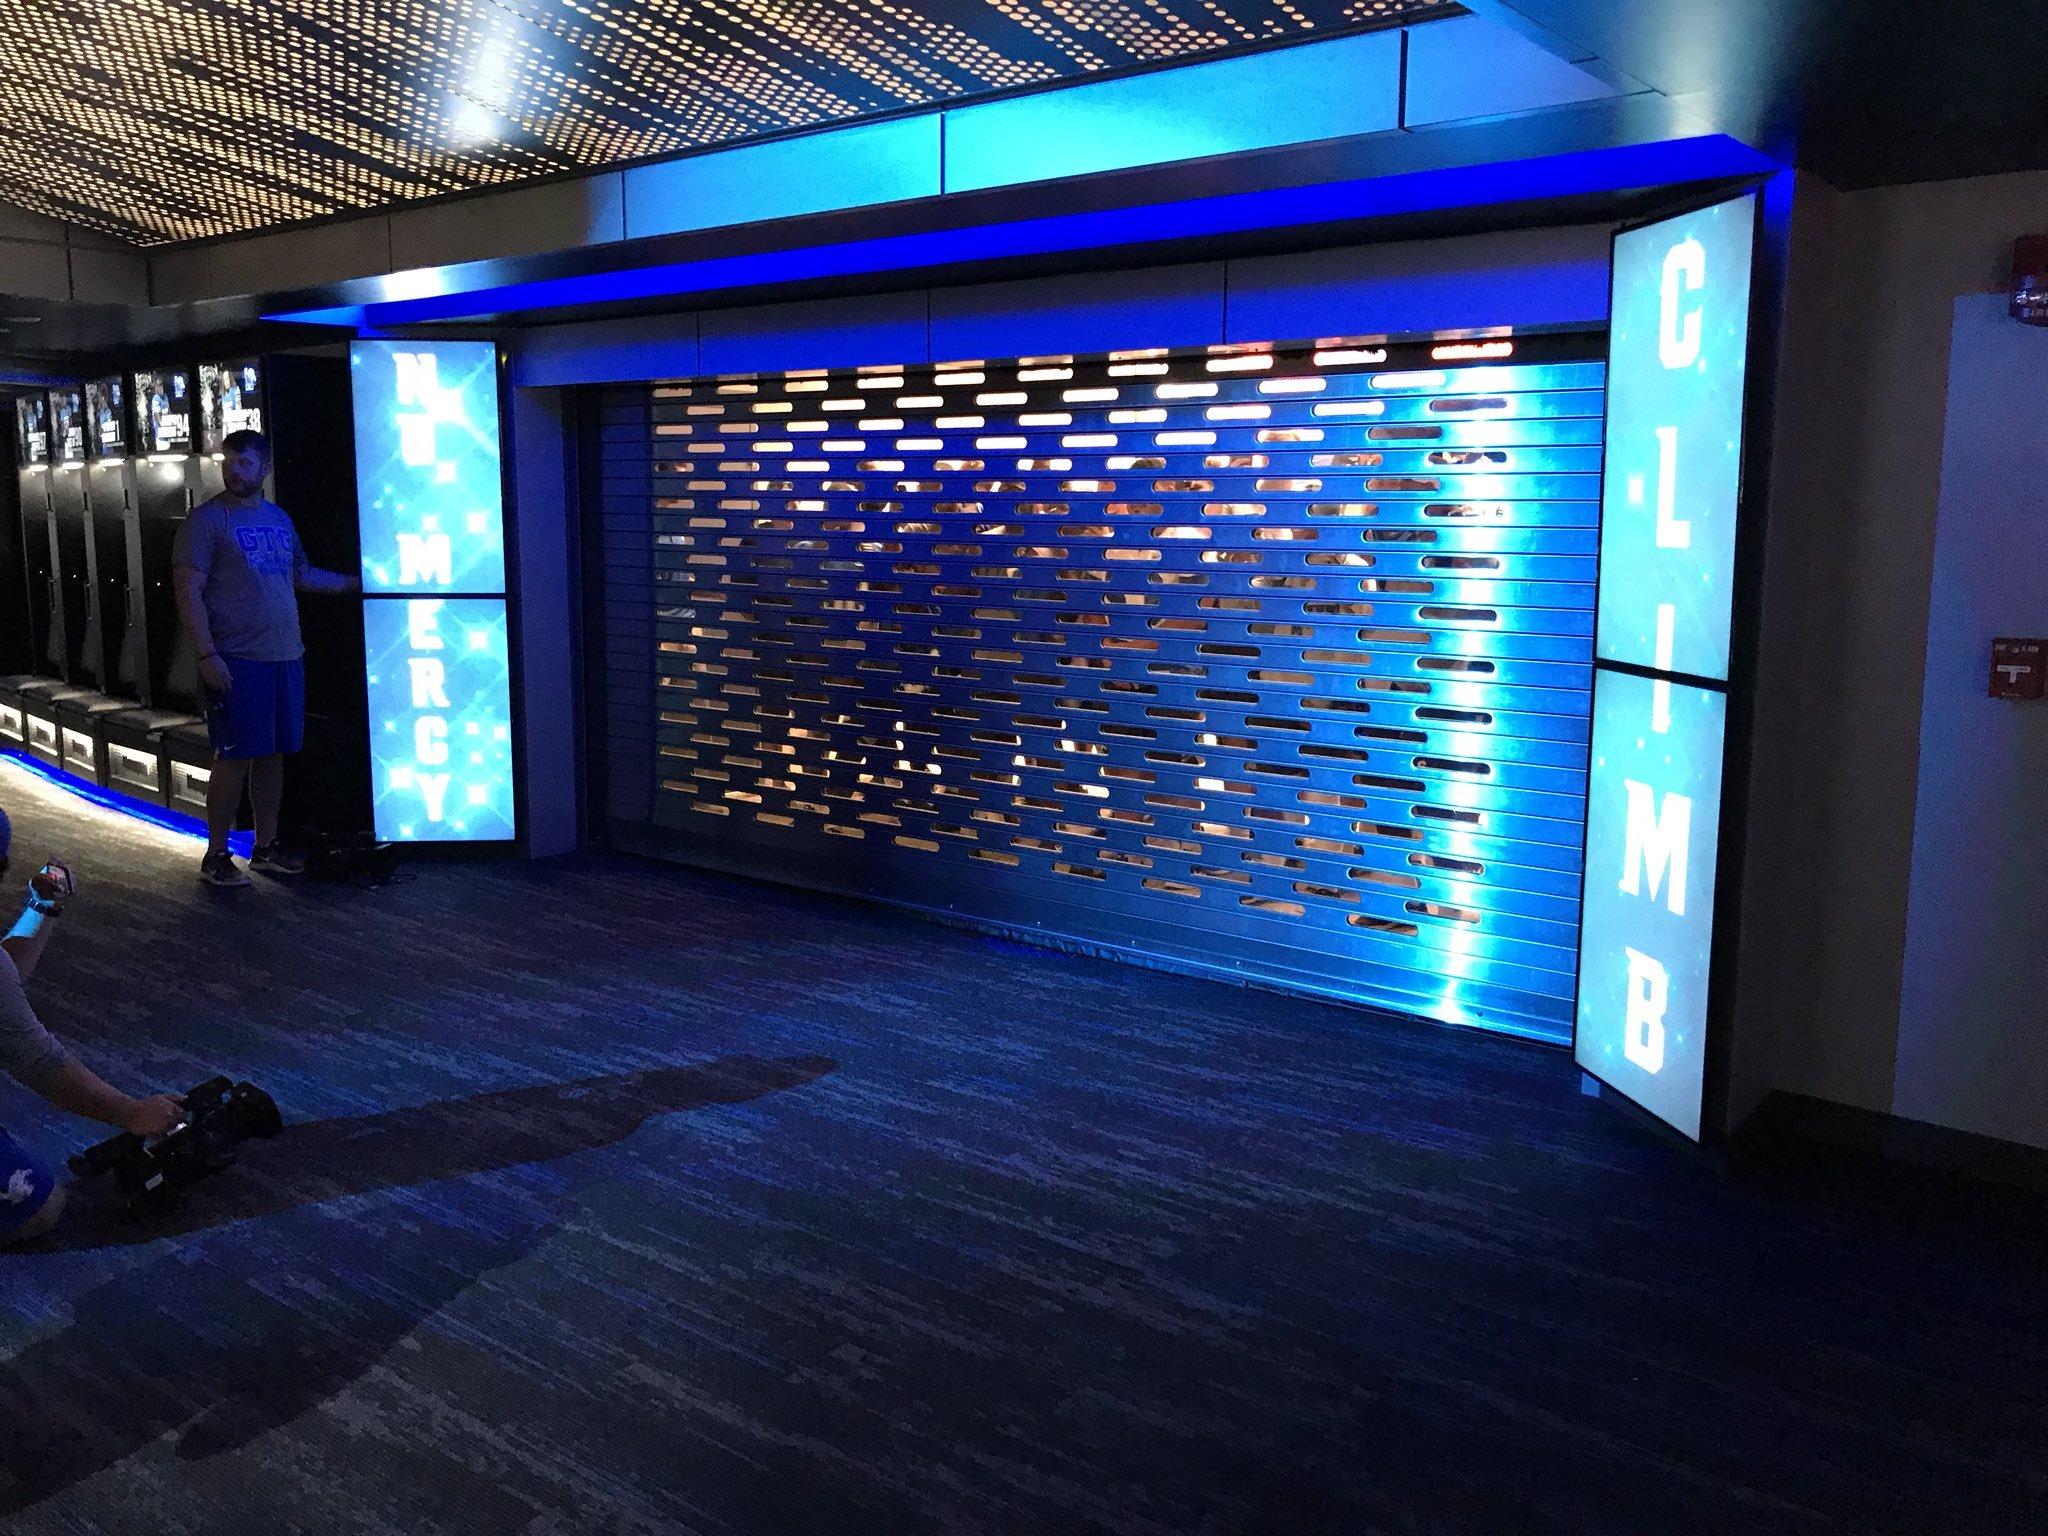 This Memphis Football Team S New Locker Room Looks Like An